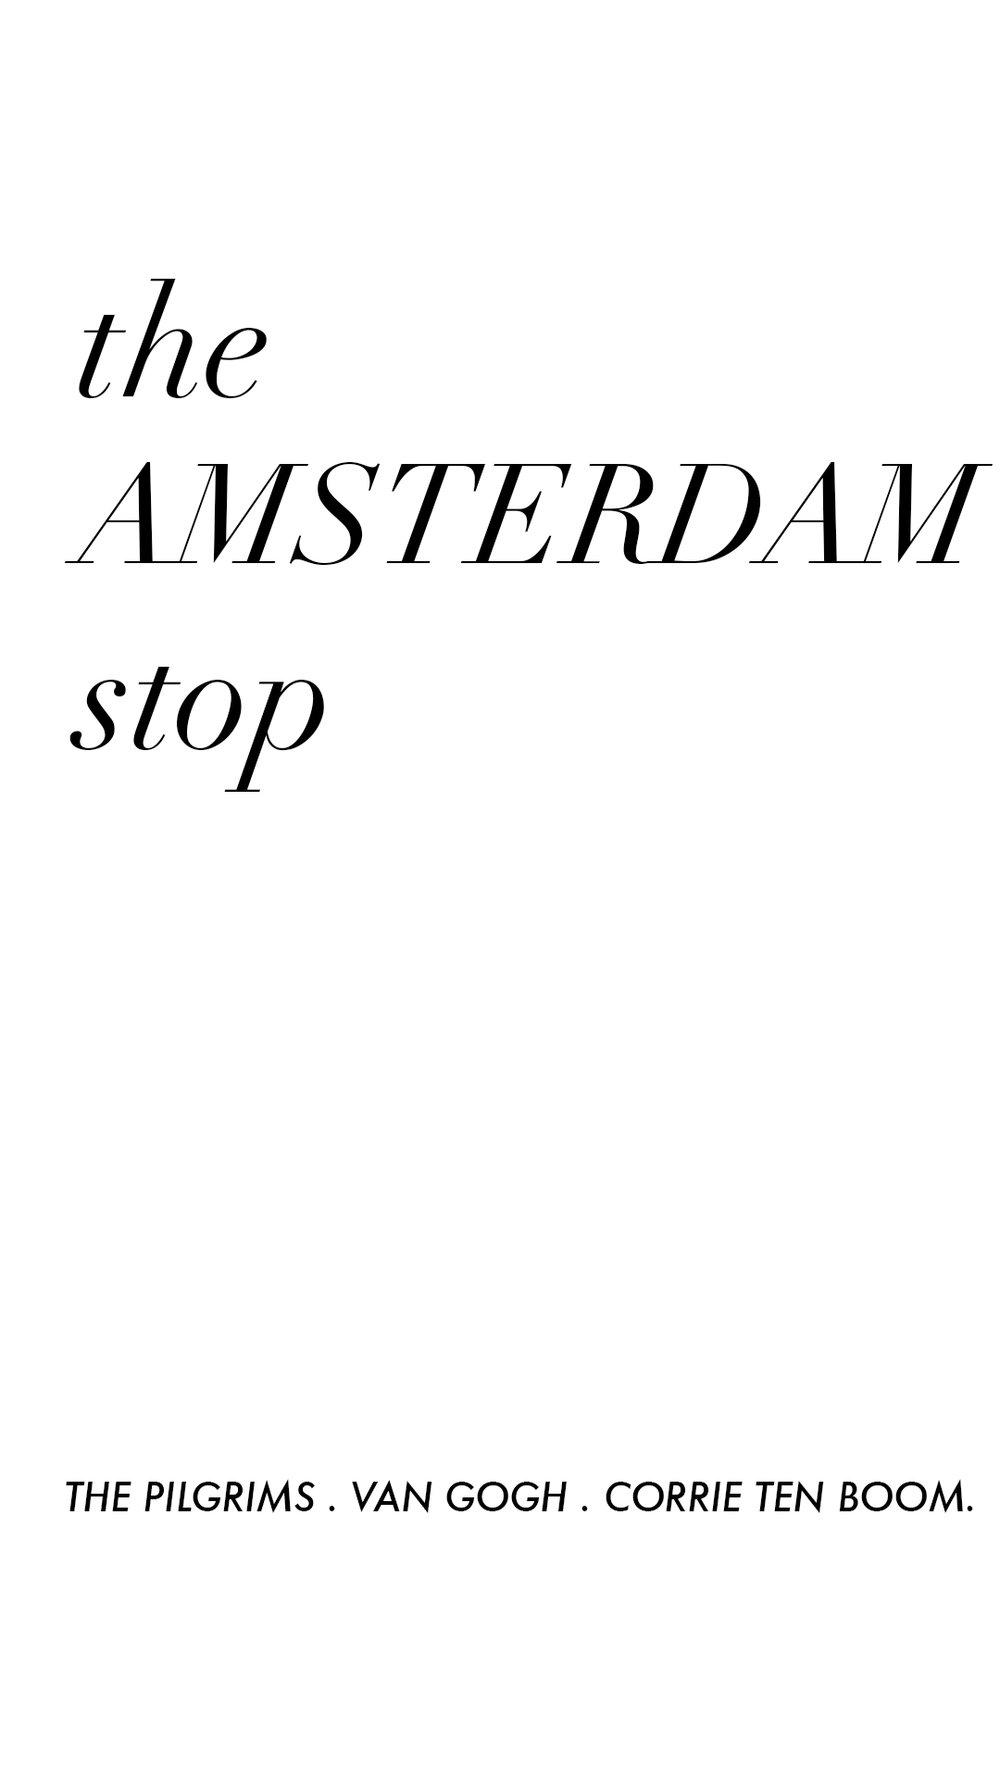 5_TEV_AMSTERDAM.jpg